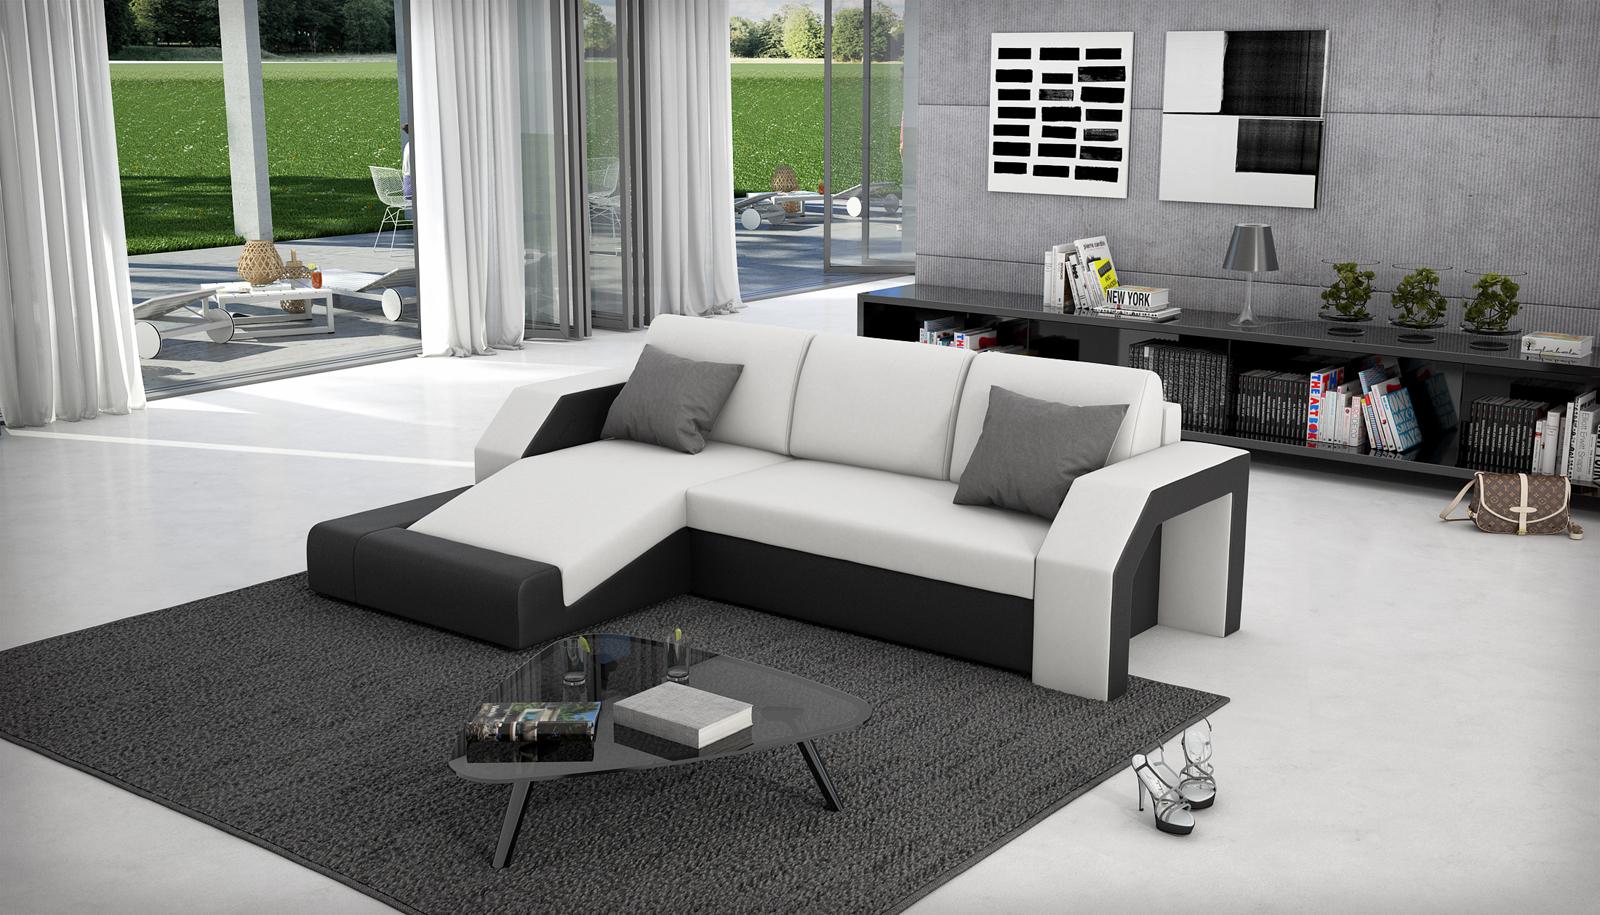 sam schlafsofa wei schwarz ecksofa milagro 145 x 281 cm. Black Bedroom Furniture Sets. Home Design Ideas